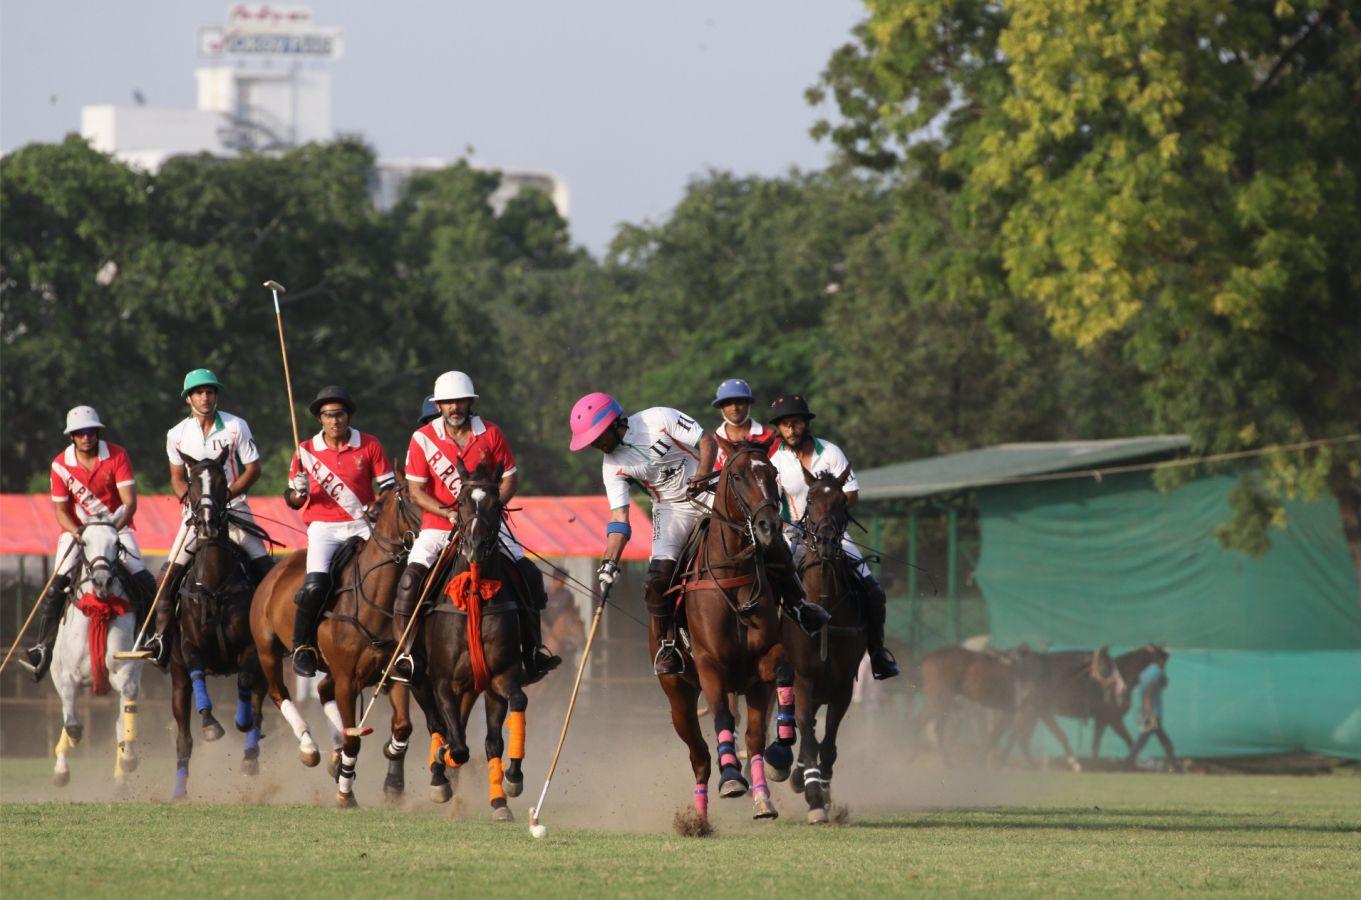 general Amar Singh Kanota Cup, Rajasthan Polo Club, Jaipur, Rajasthan, Jaipur Polo, Sahara Warriors, Mustang, Mustang polo, Cote Zegers, Salim Azmi, Pranav Kapur, Hurr Ali, Th Lokendra Singh Rathore, Dhananjai Singh Rathore, Vishwaraj Singh Bhati Br